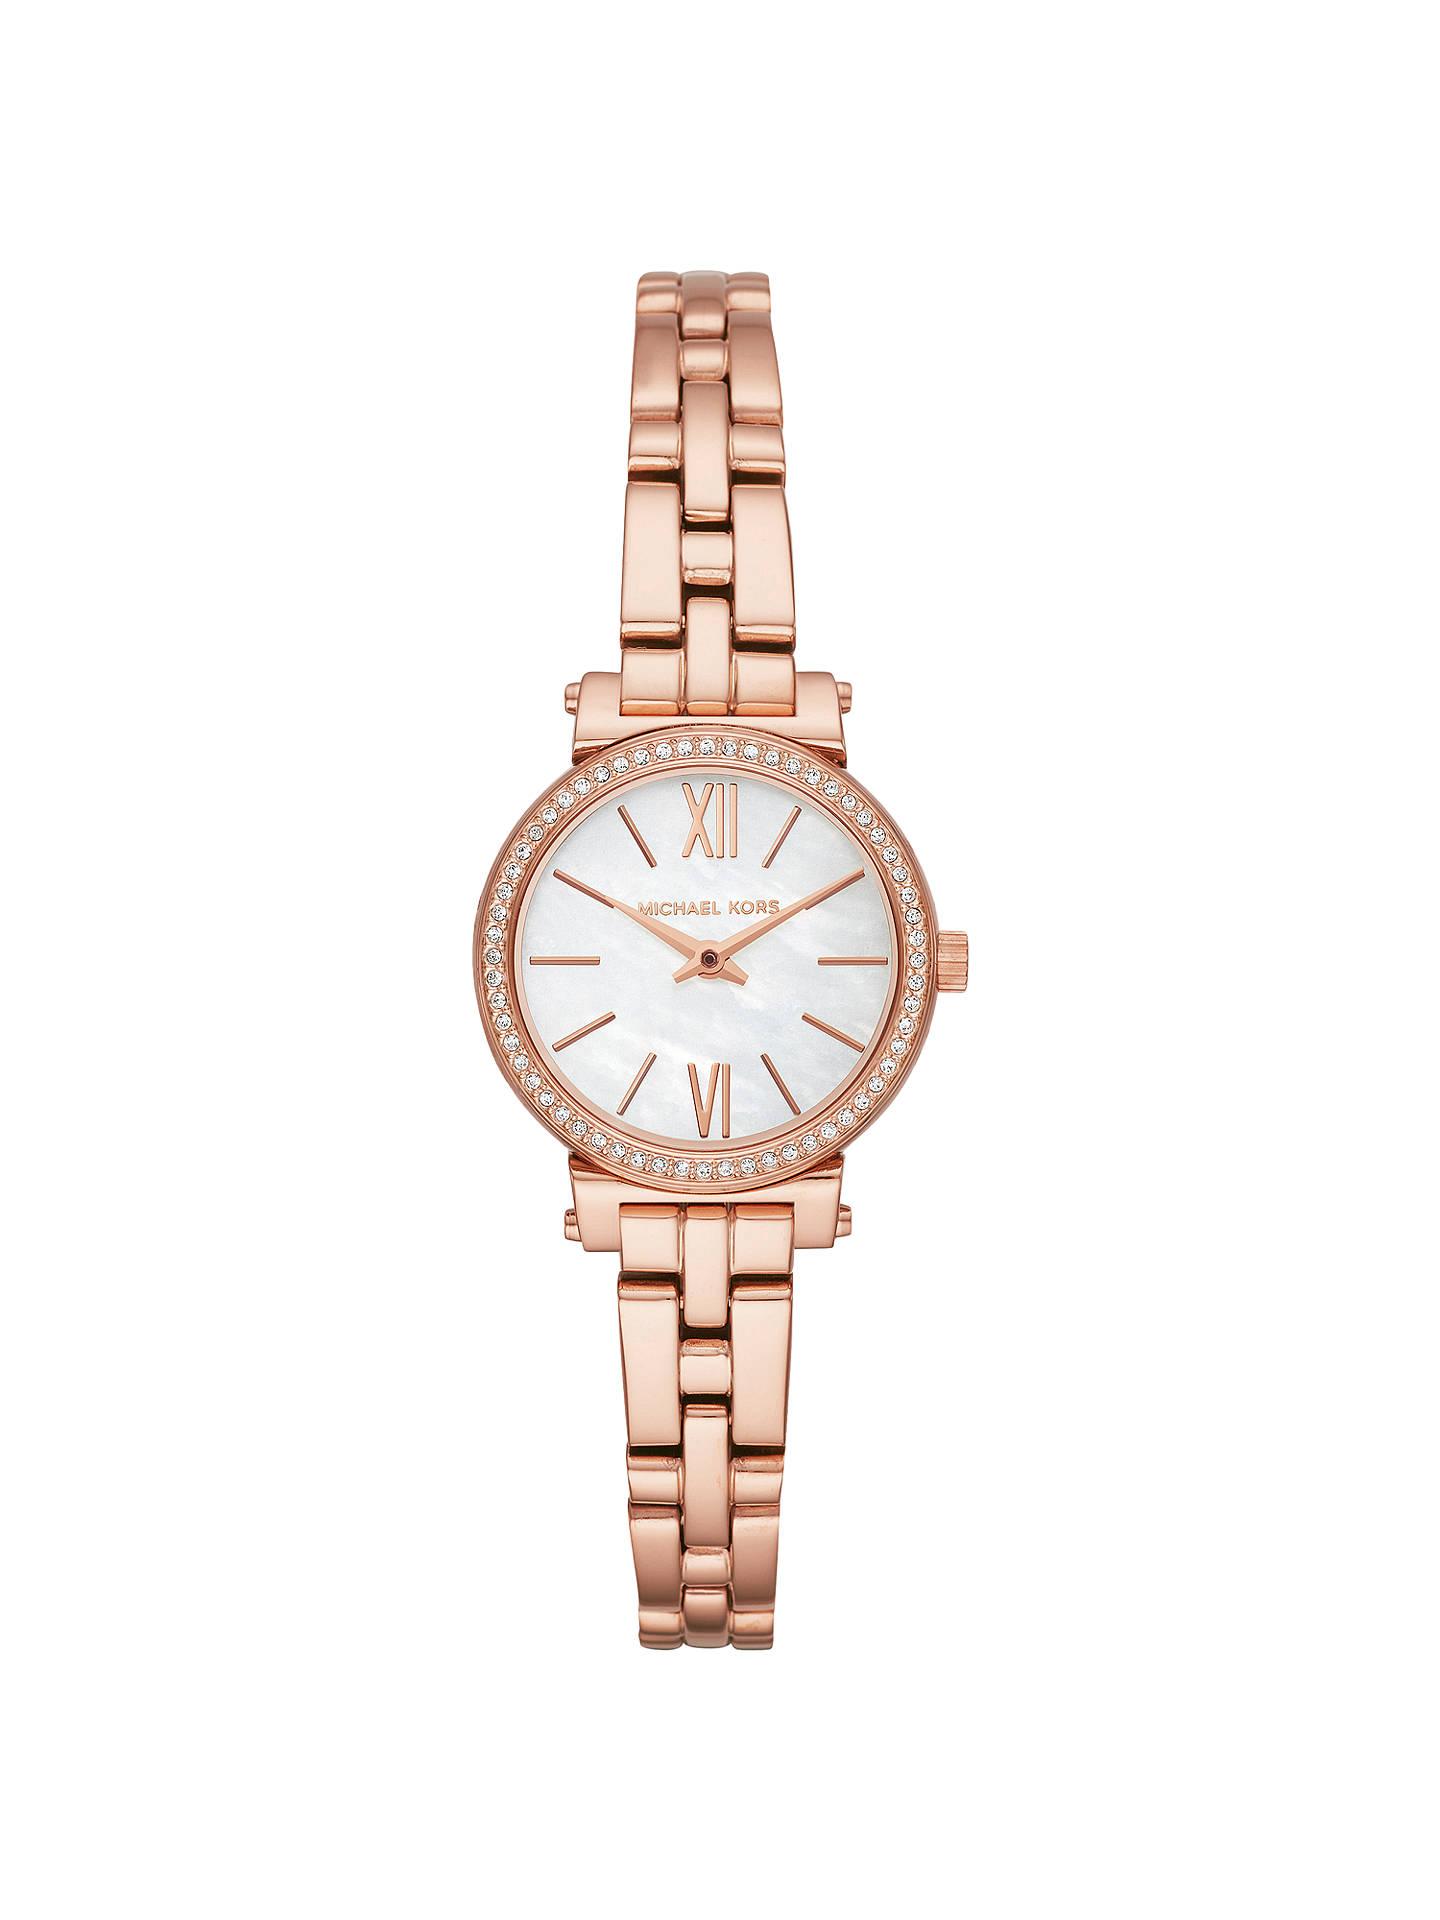 b0edd2c85e Buy Michael Kors MK3834 Women s Petite Sofie Bracelet Strap Watch